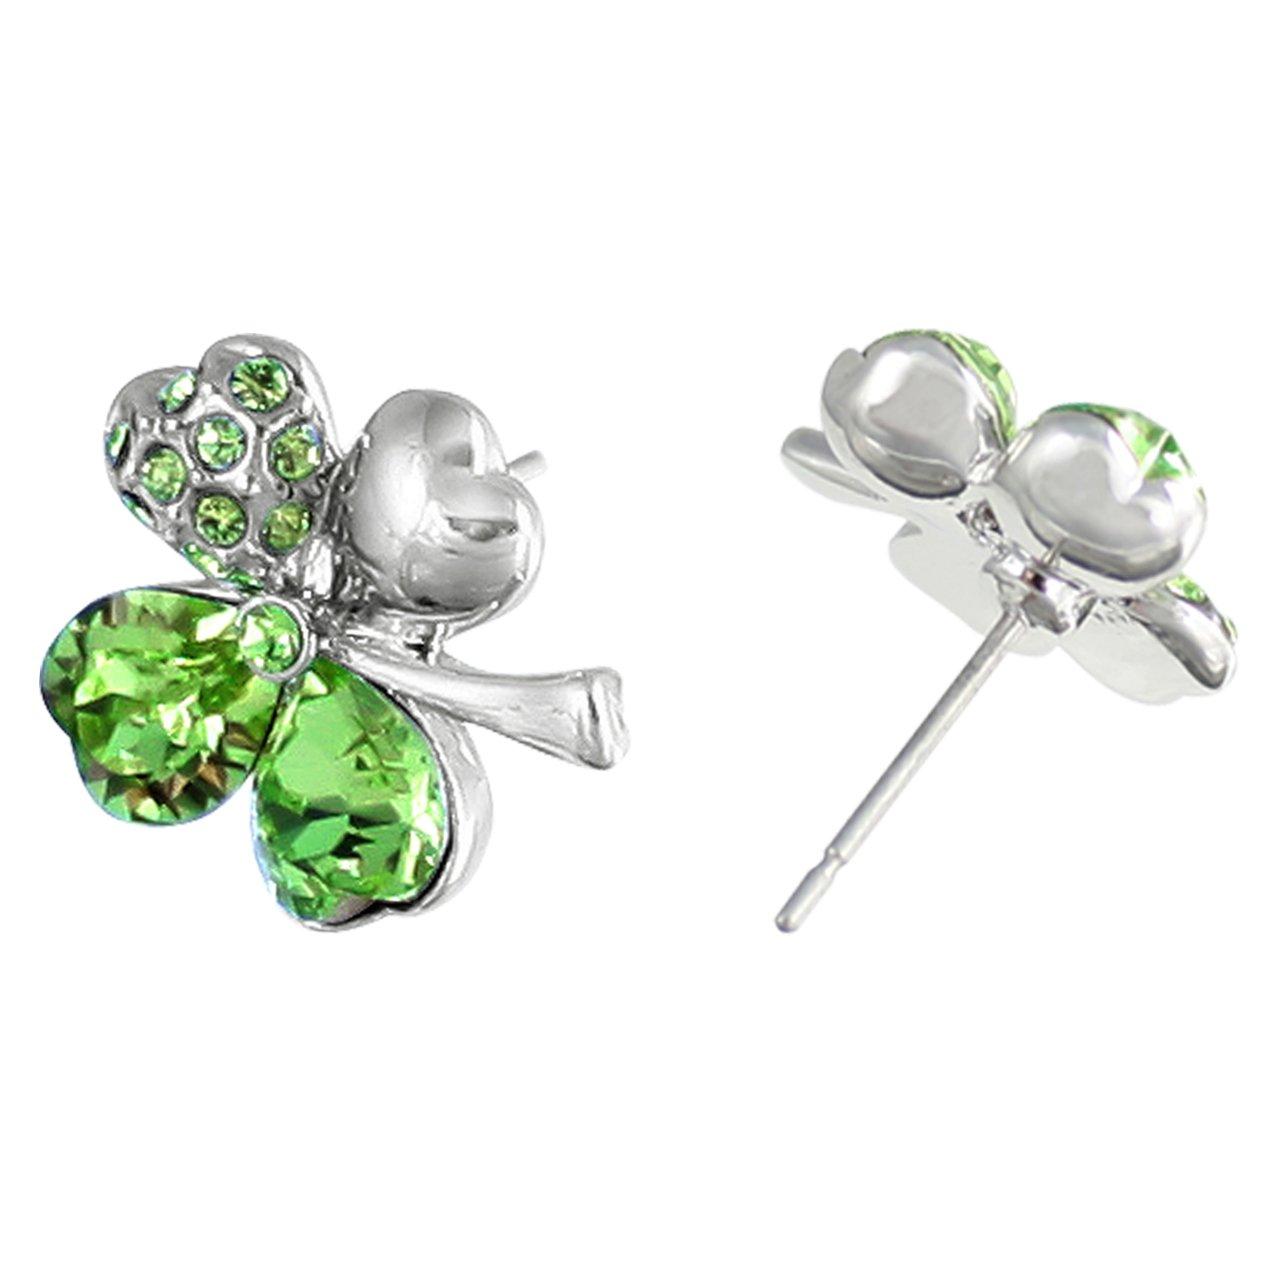 Dahlia Four Leaf Clover Stud Earrings with Swarovski Crystals, Rhodium Plated